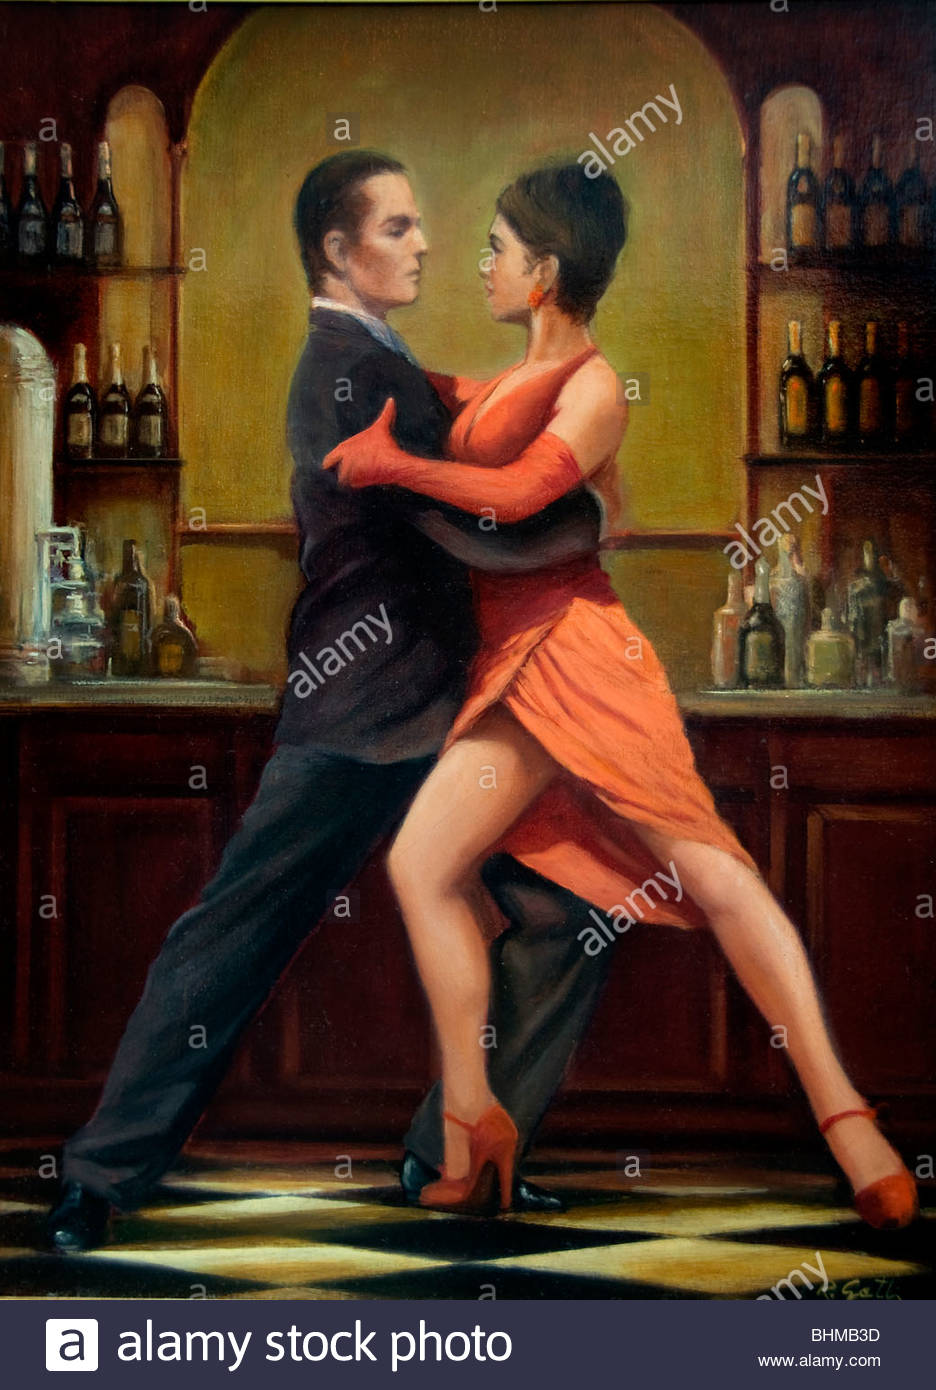 Tango Buenos Aires Argentina La Boca El Caminito firmar Pintura callejera Foto de stock